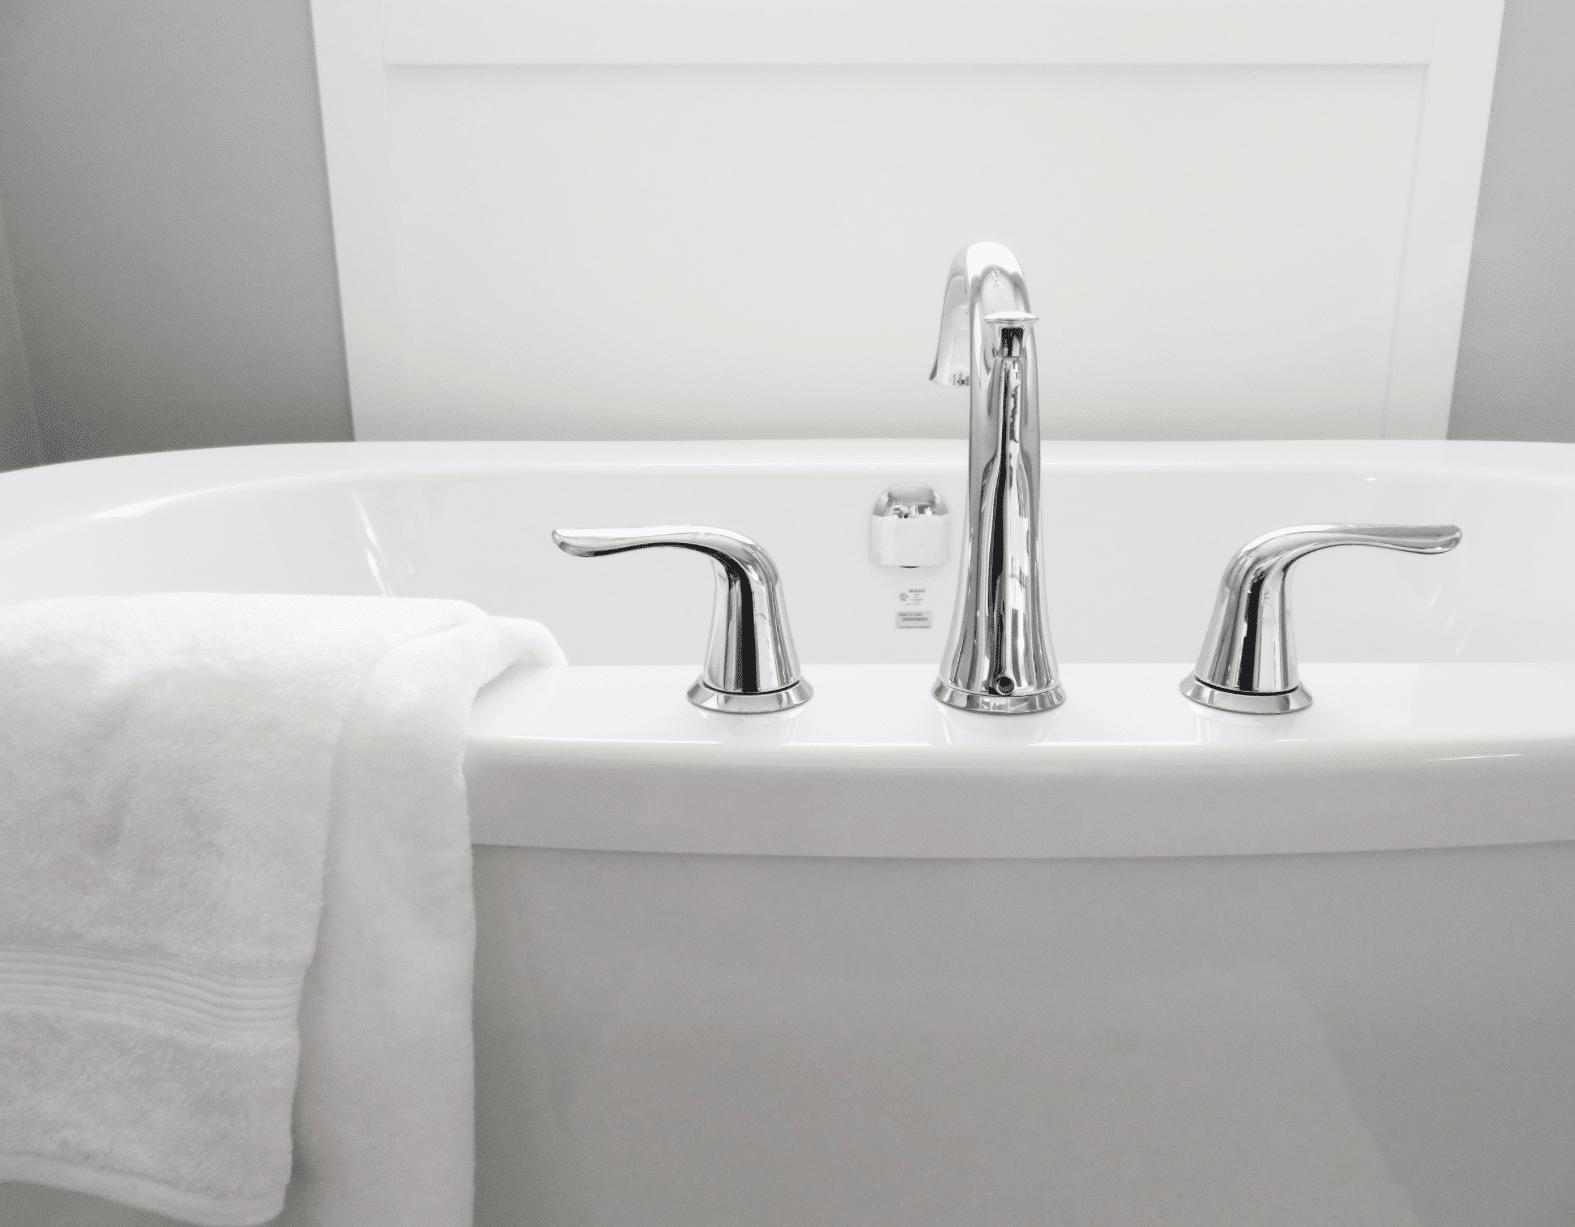 bathroom supply company chooses OMS+